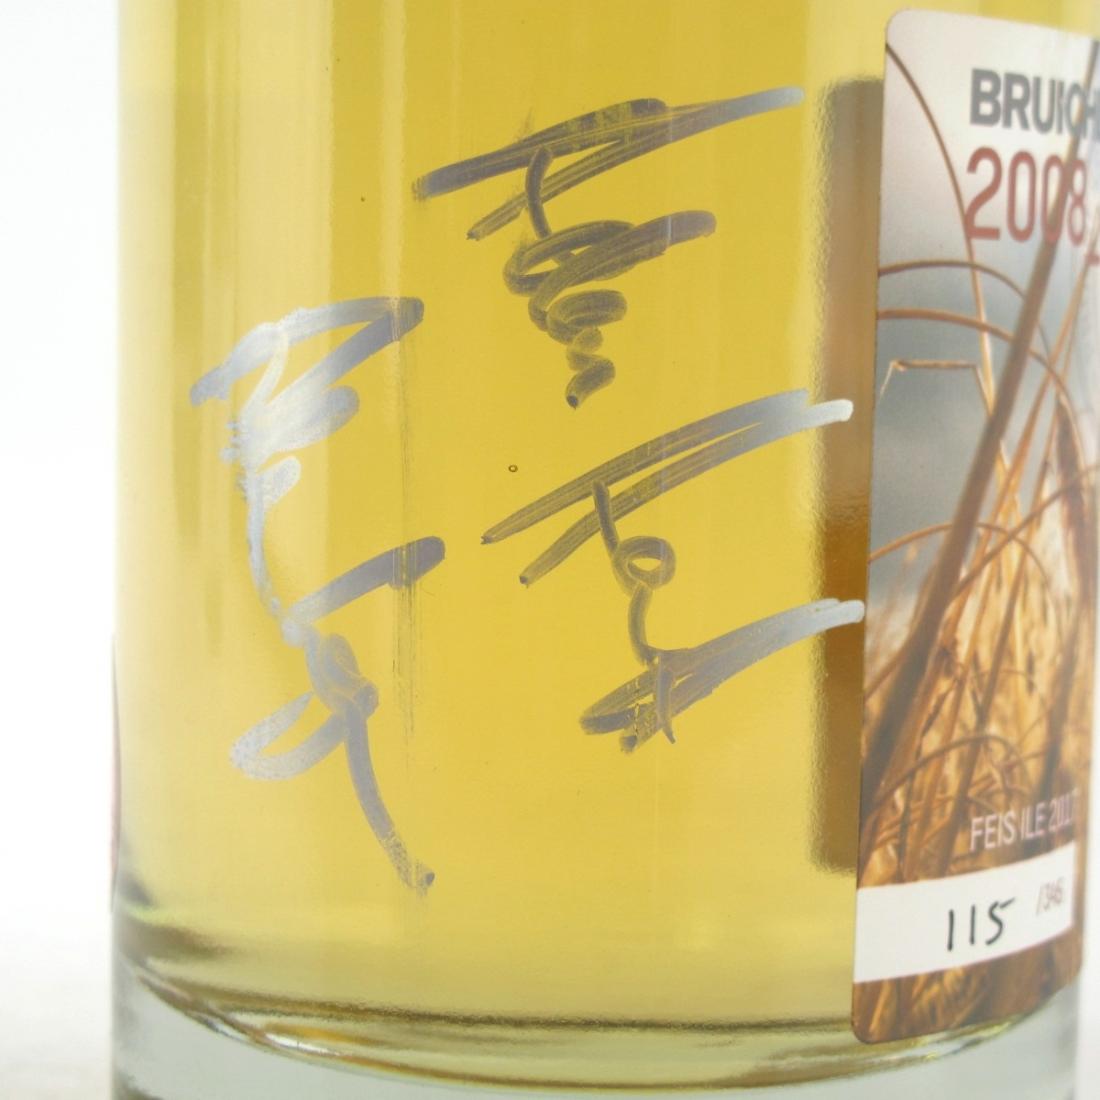 Bruichladdich 2008 Islay Grown Bere Barley Valinch / Feis Ile 2017